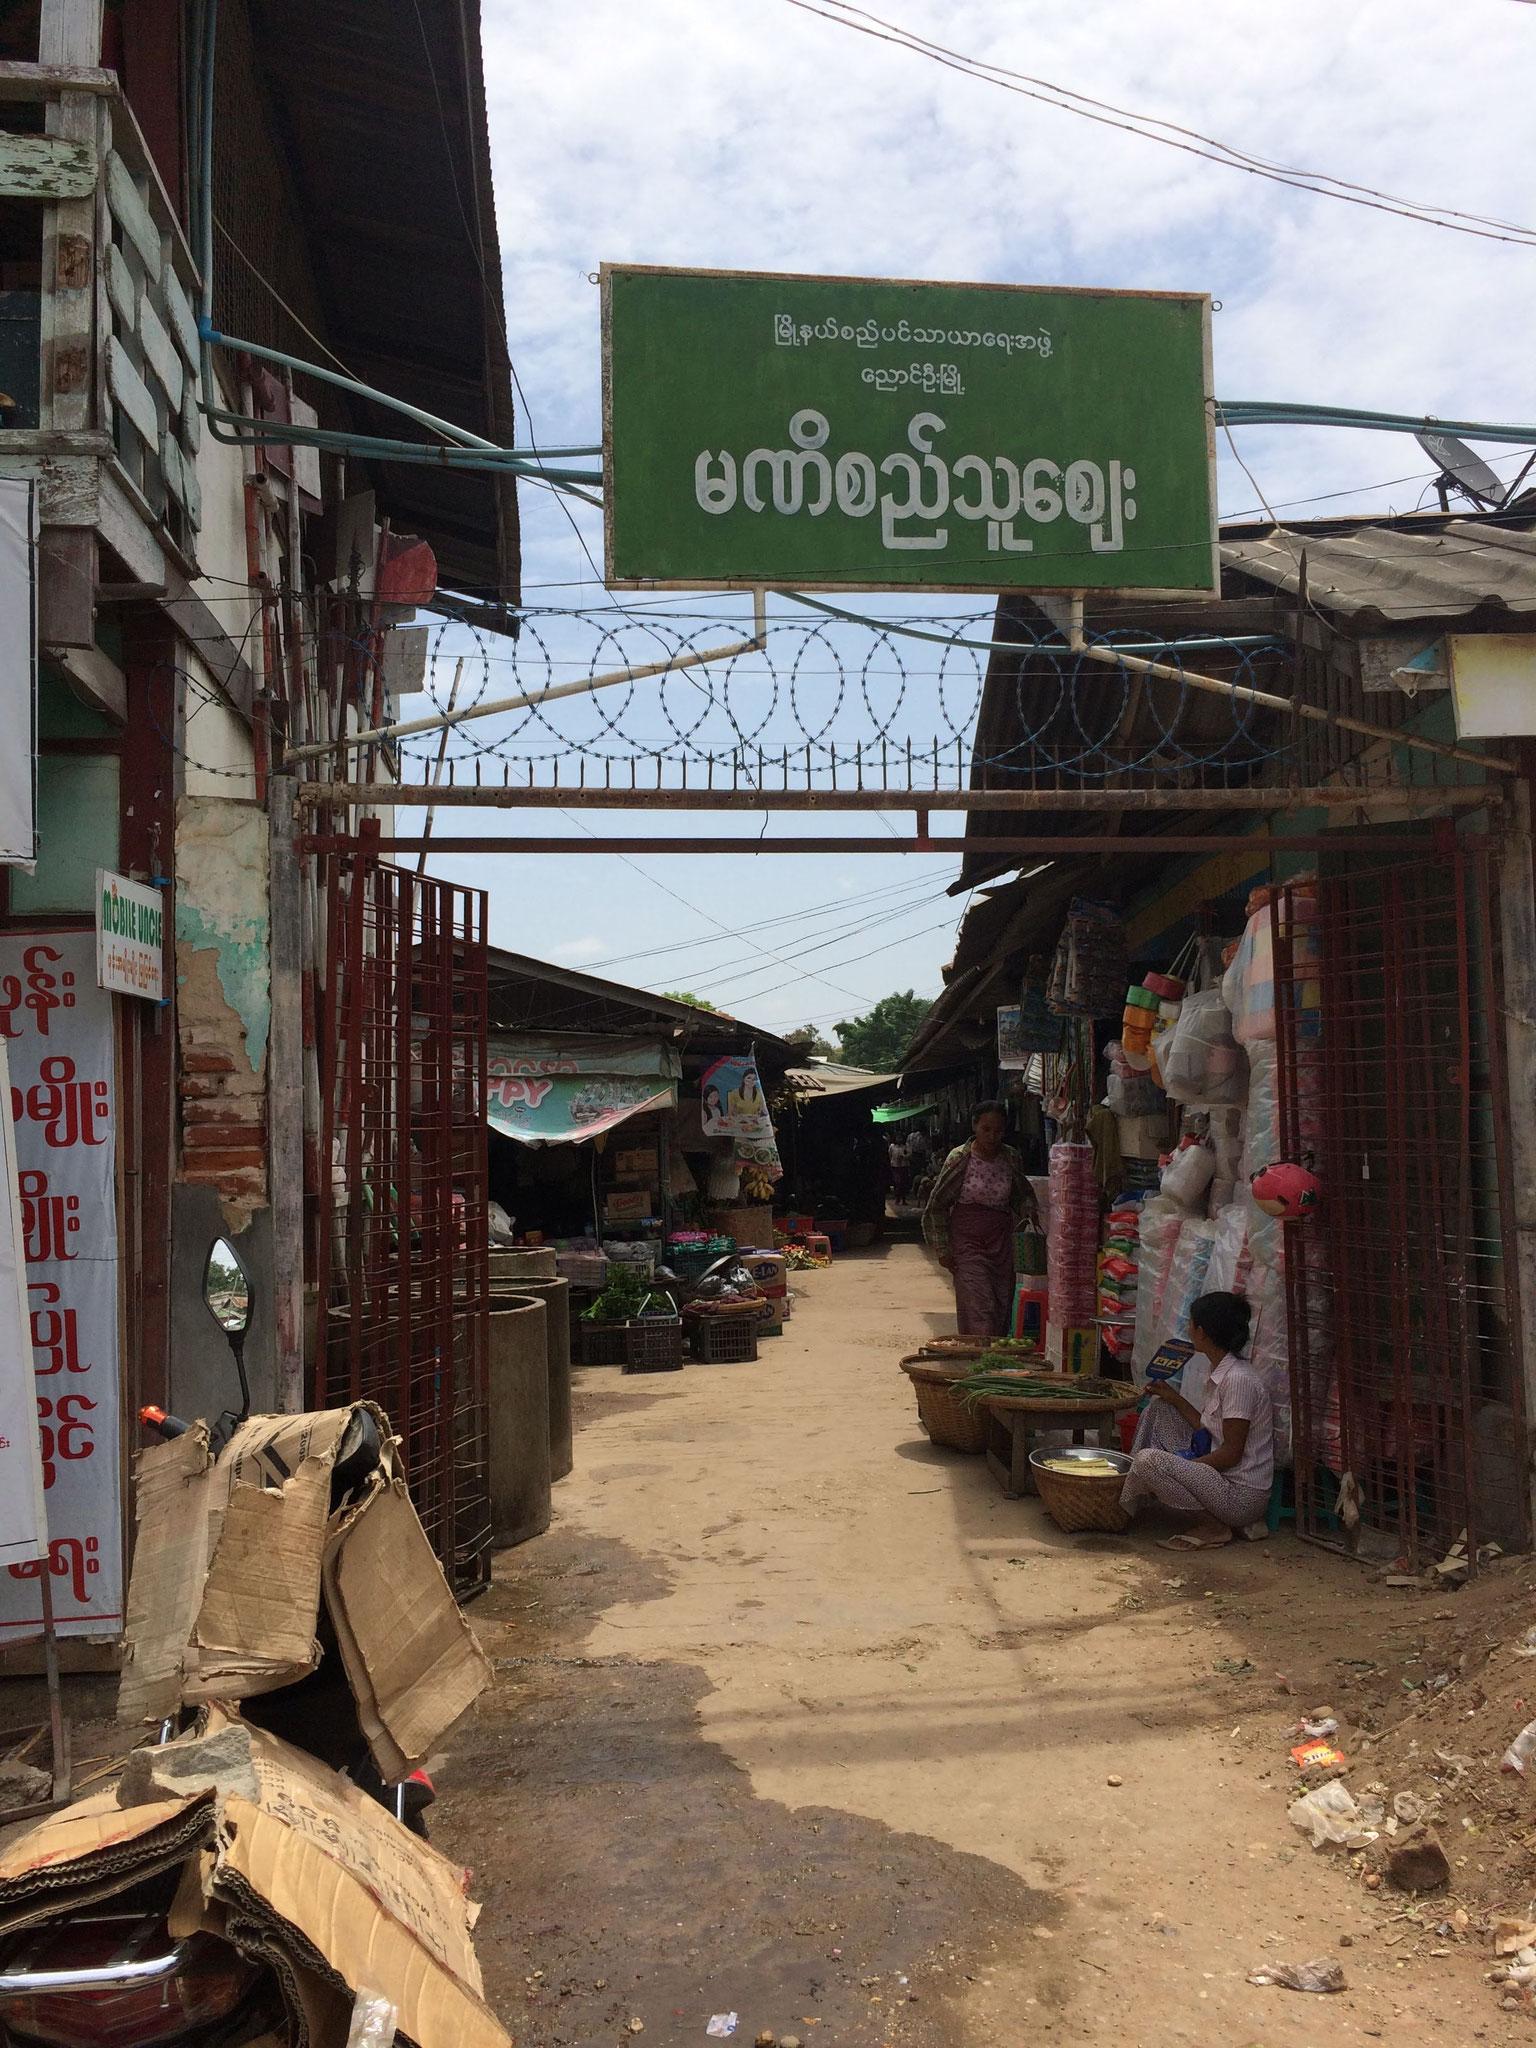 Eingang zum Labyrinth-Markt - Alllllles wird verkauft! ;-)